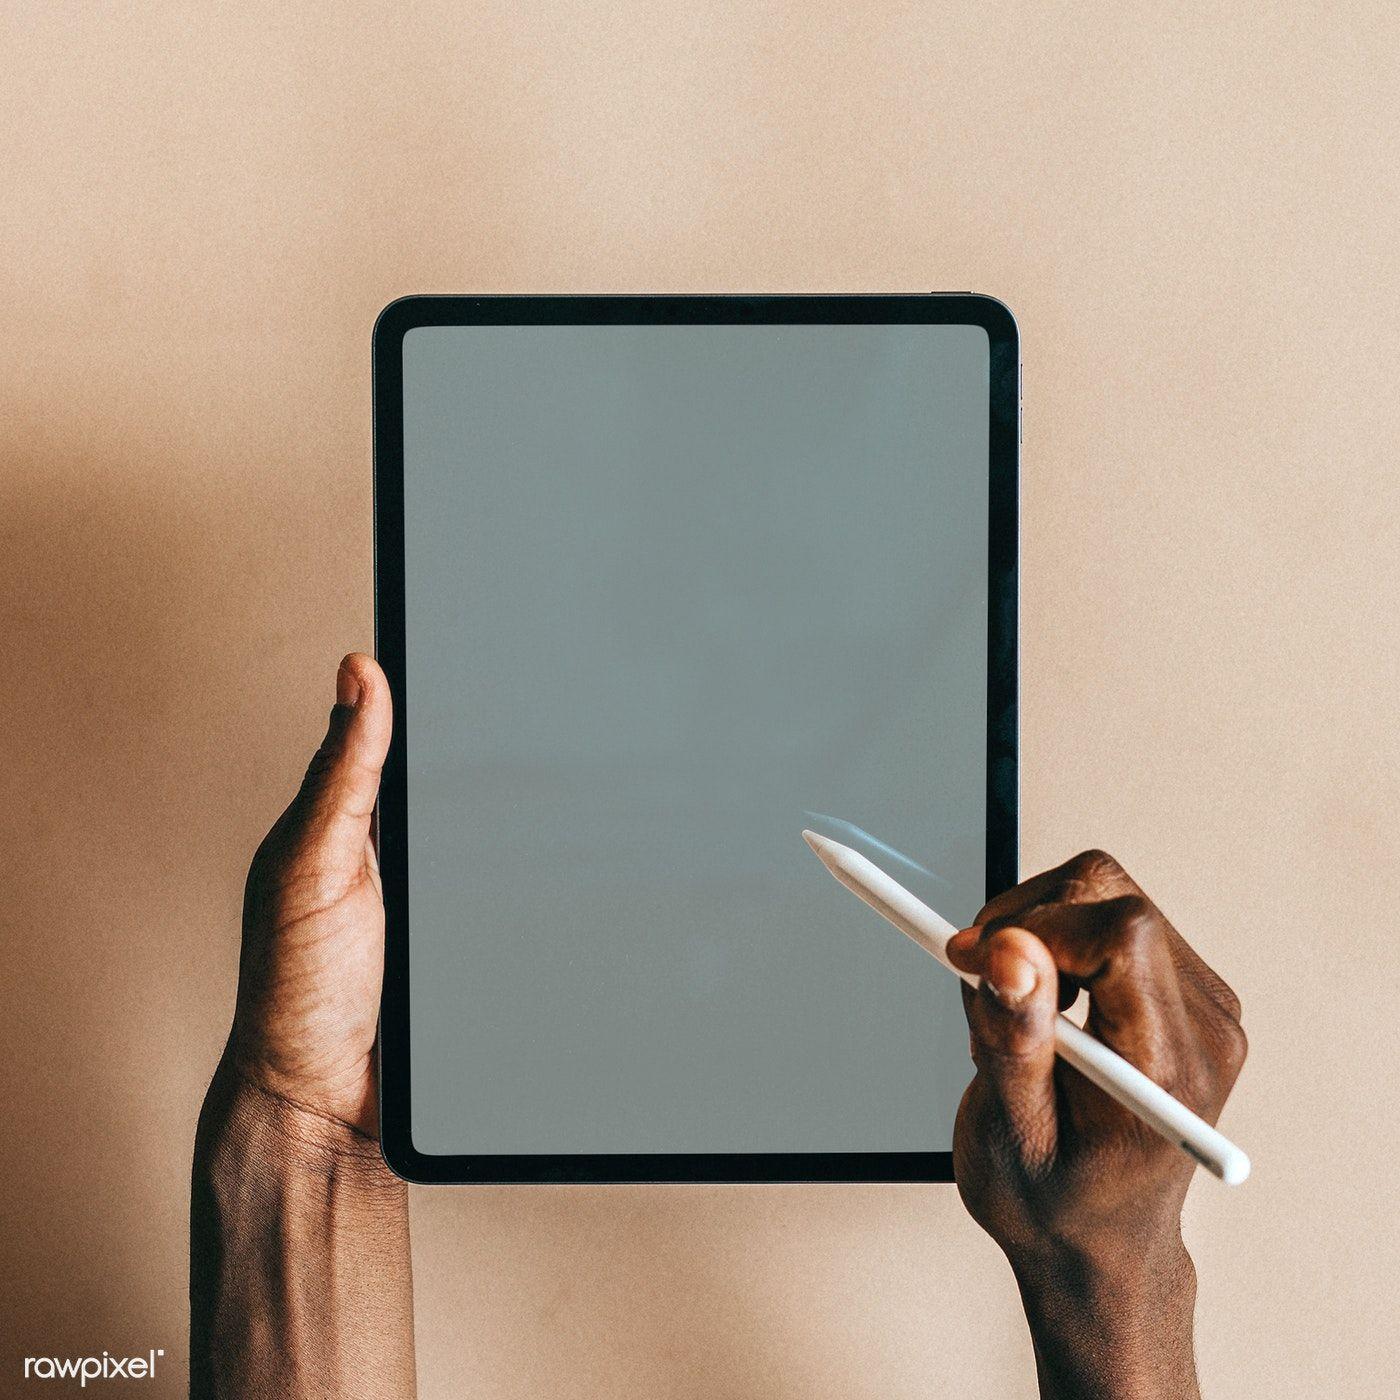 Download Premium Psd Of Black Man Using A Digital Tablet Mockup 1226328 Digital Tablet Mockup Tablet